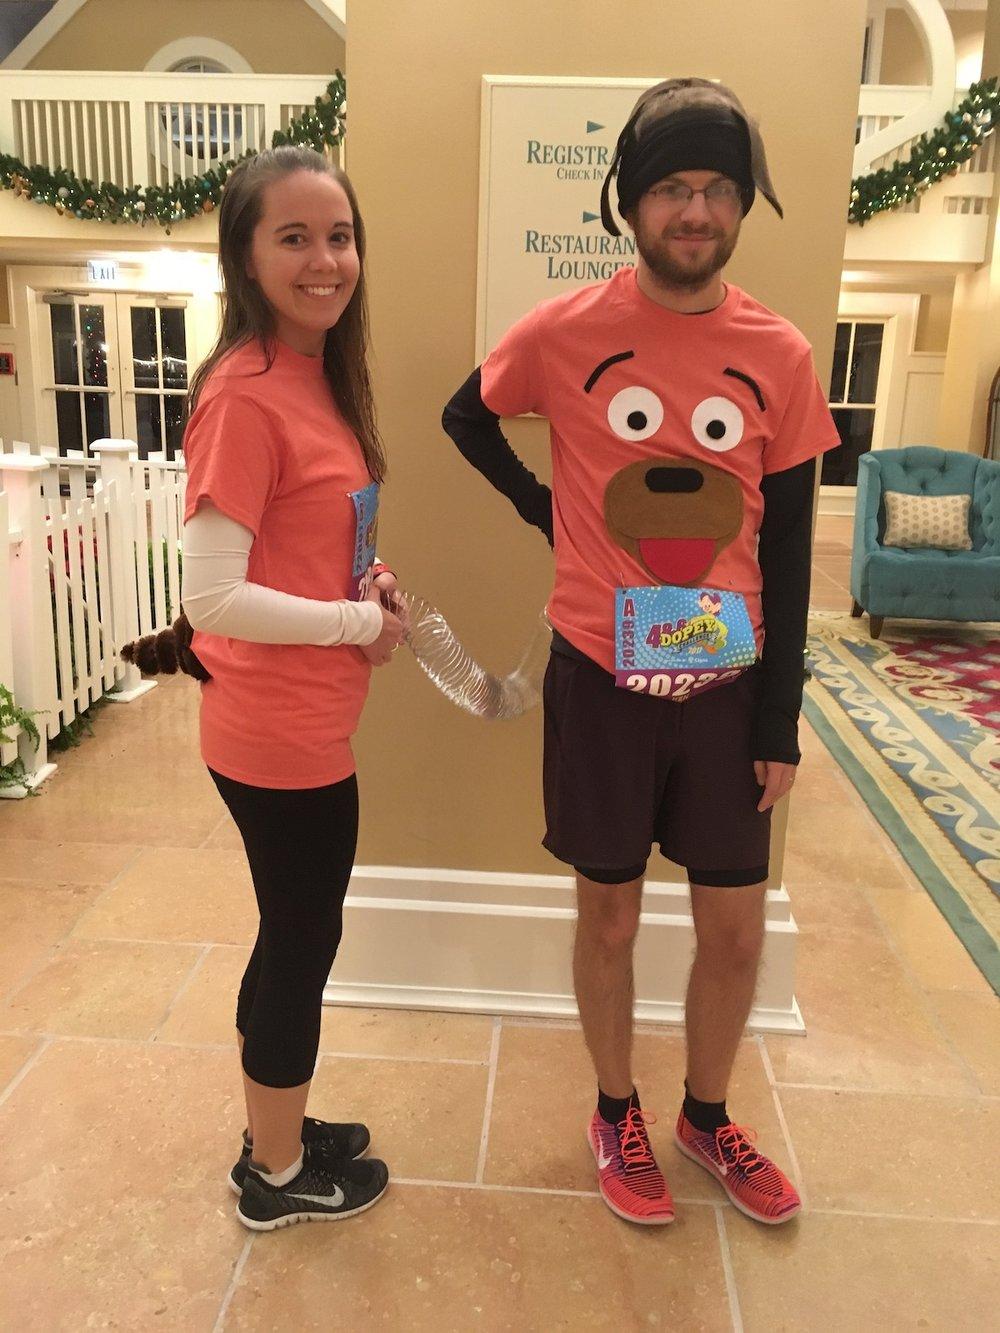 rundisney+disney+world+half+marathon+costume+3